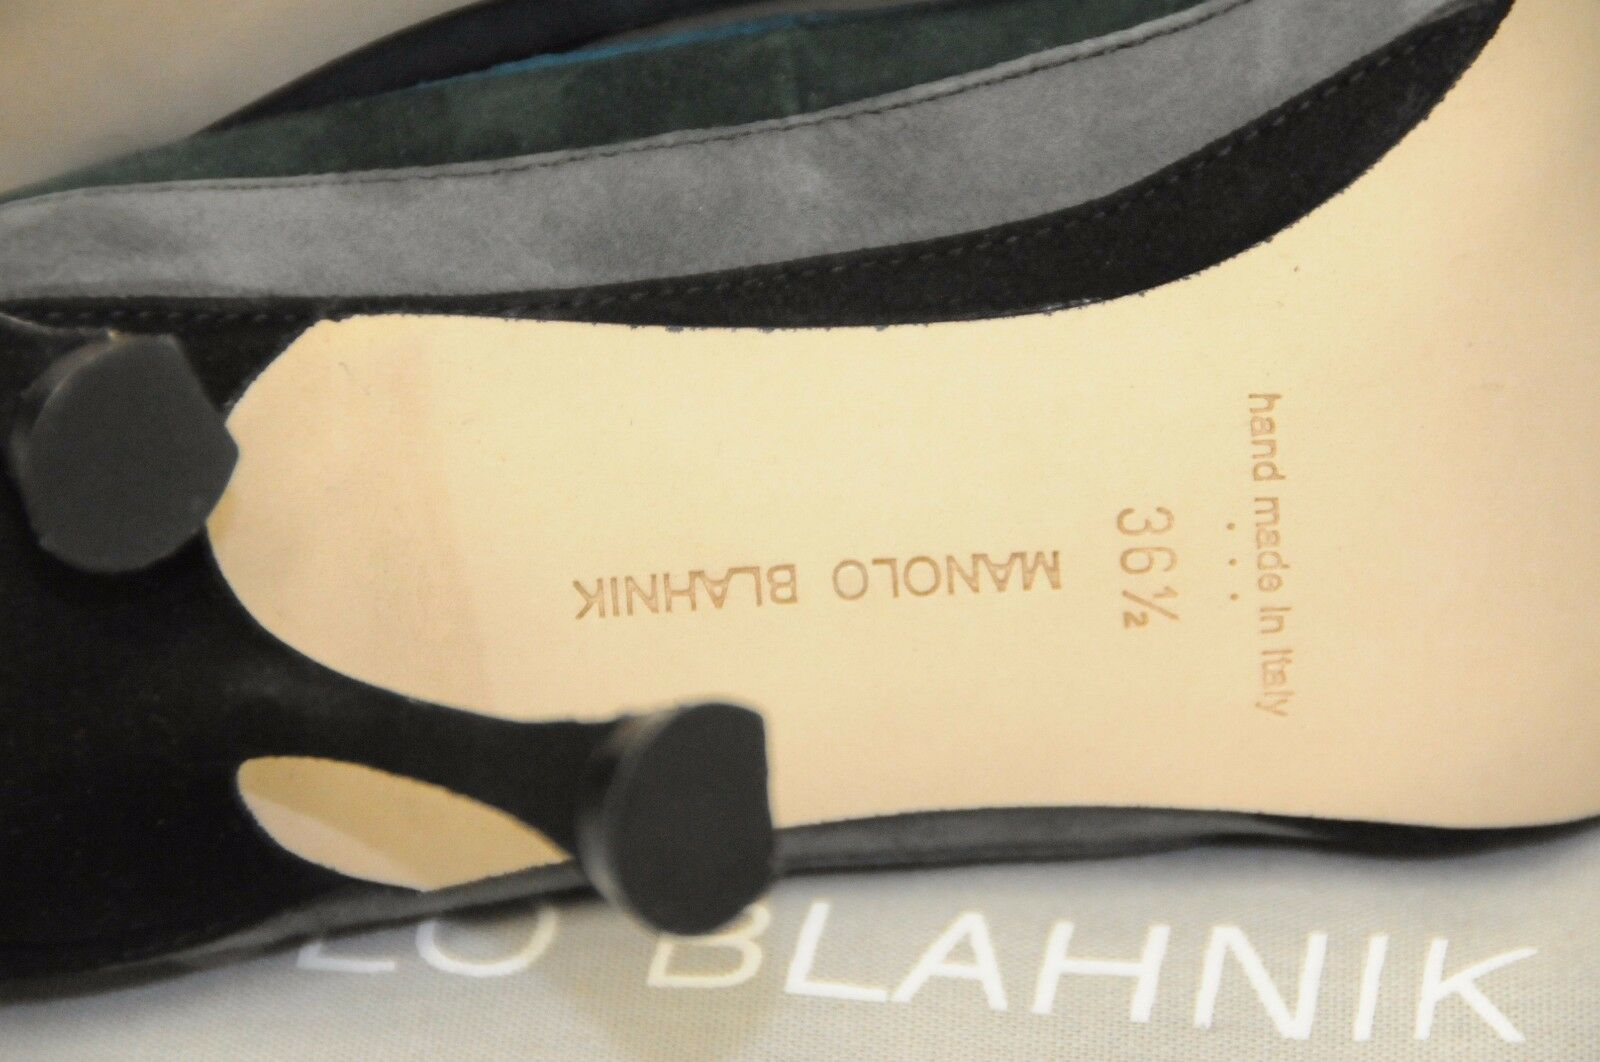 985 New Manolo Blahnik Grey Teal Green Black Black Black Suede shoes BB Heels Pumps 36.5 d52fa9